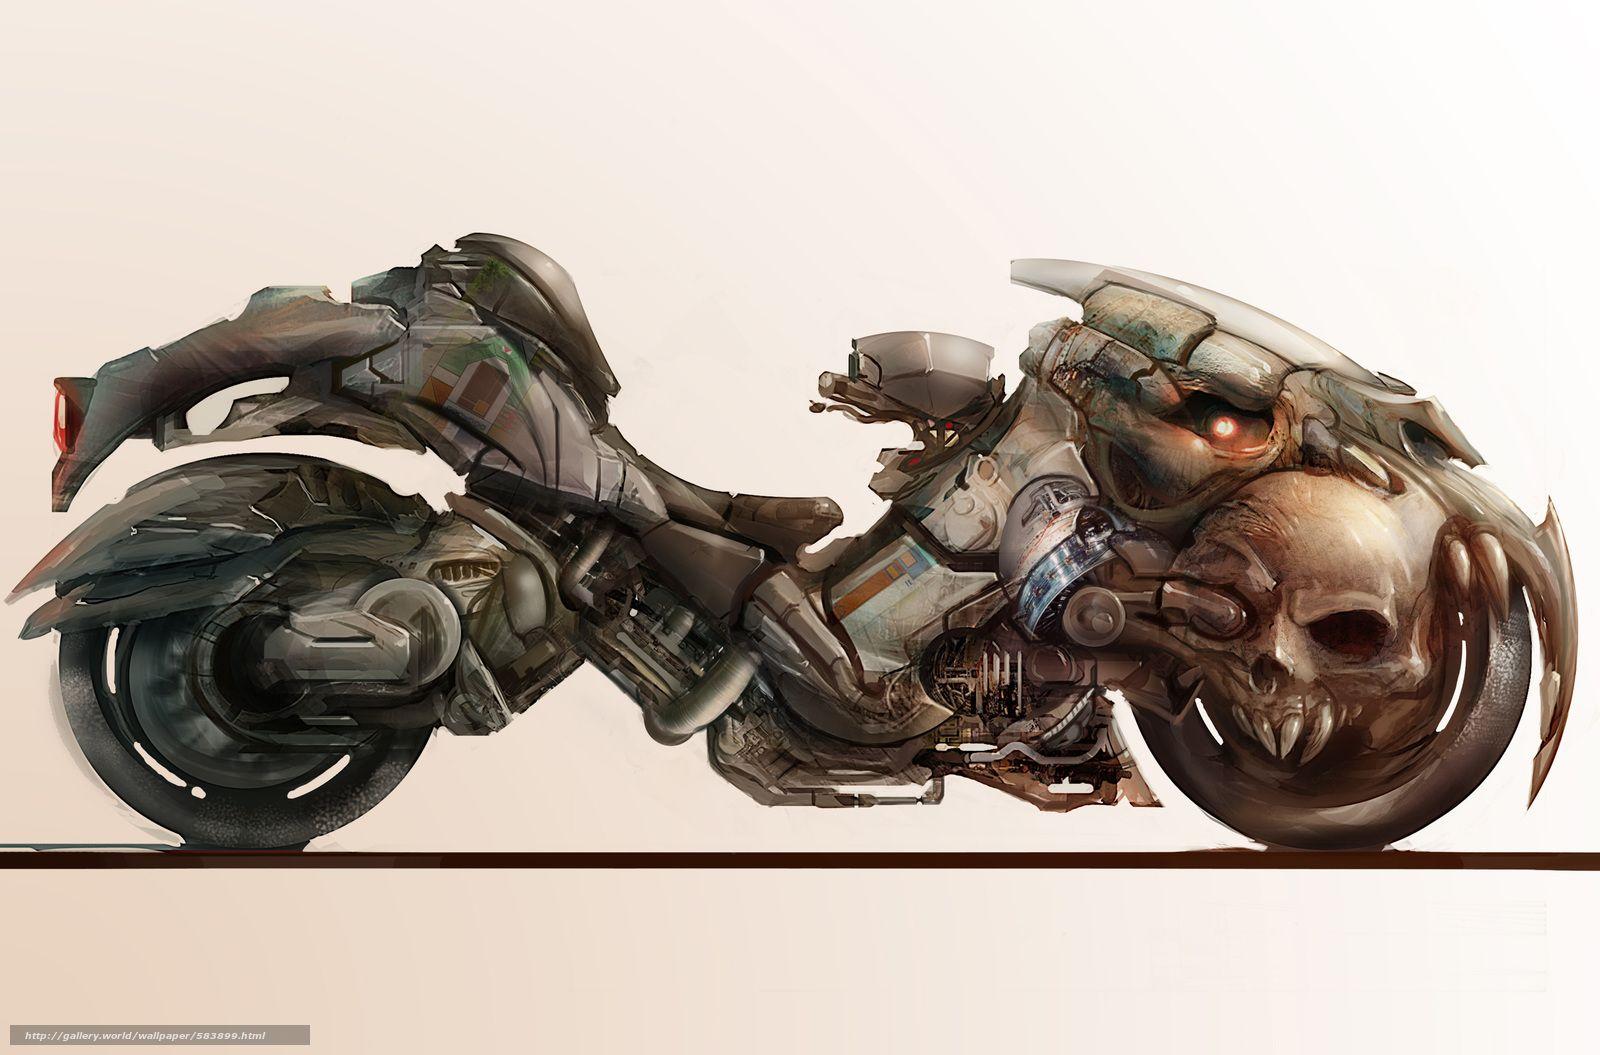 Motorcycle, Art, Fantasy,